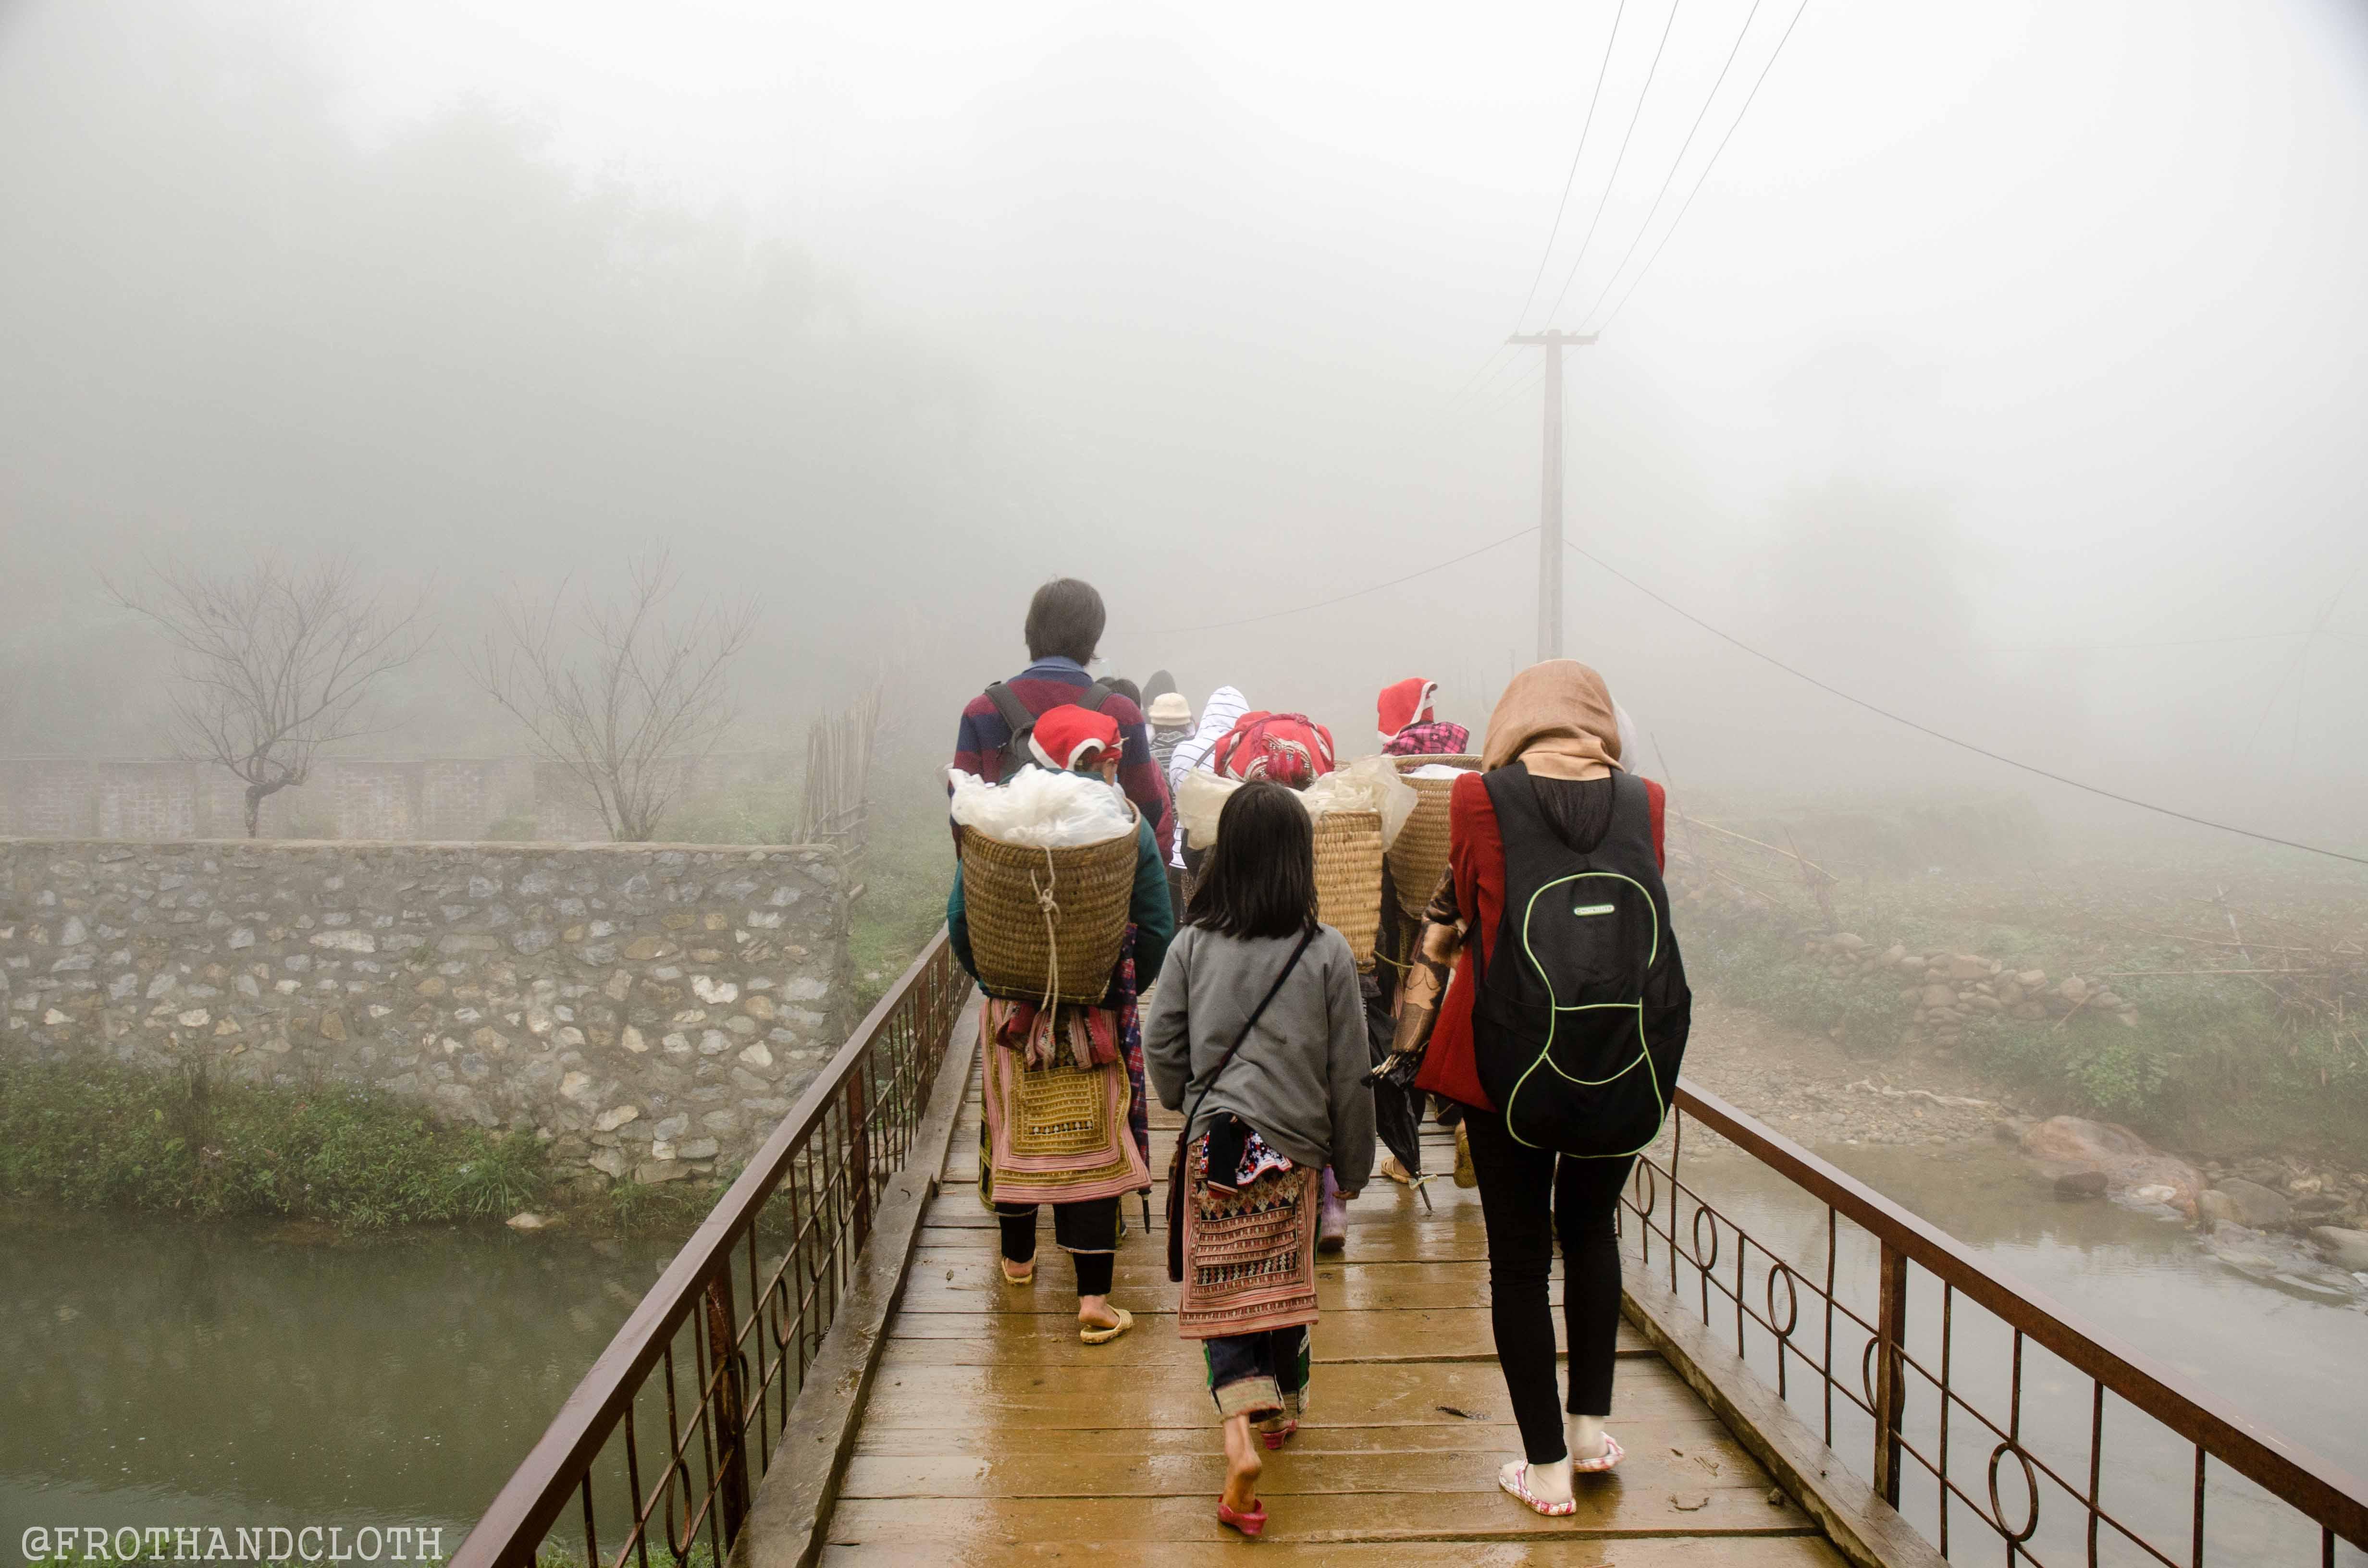 2242 - Vietnam - December 02, 2012